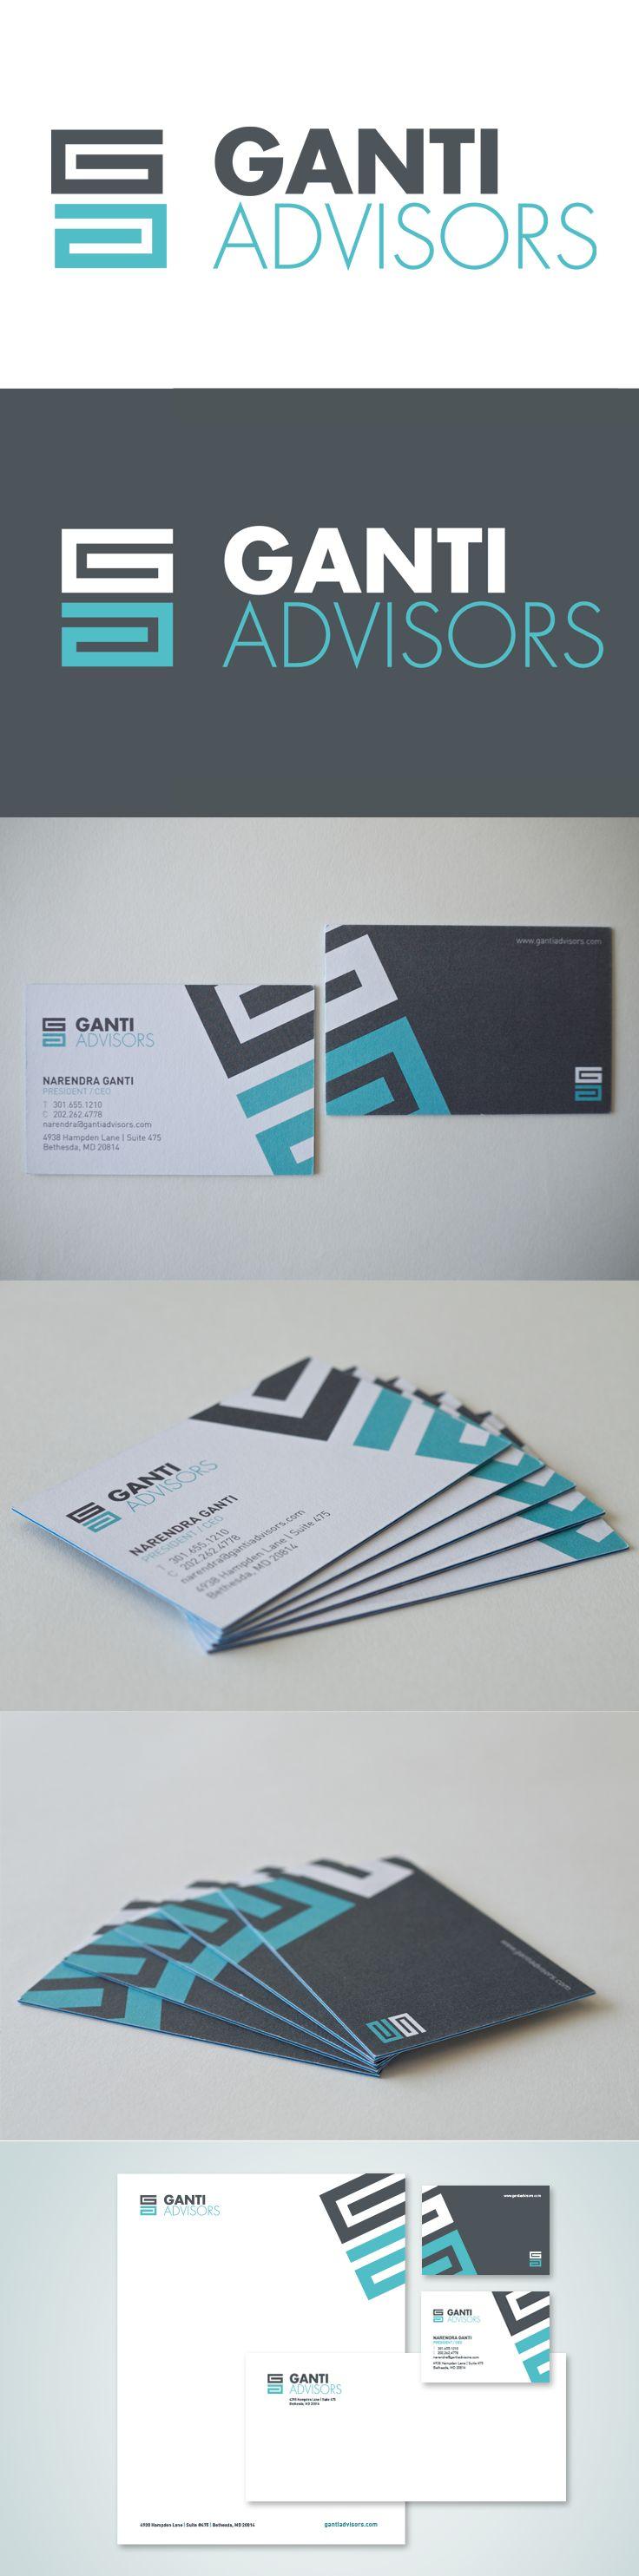 Ganti Advisors Corporate Identity by Marstudio © www.marstudio.com - Financial Logo - Corporate Collateral - Print Collateral